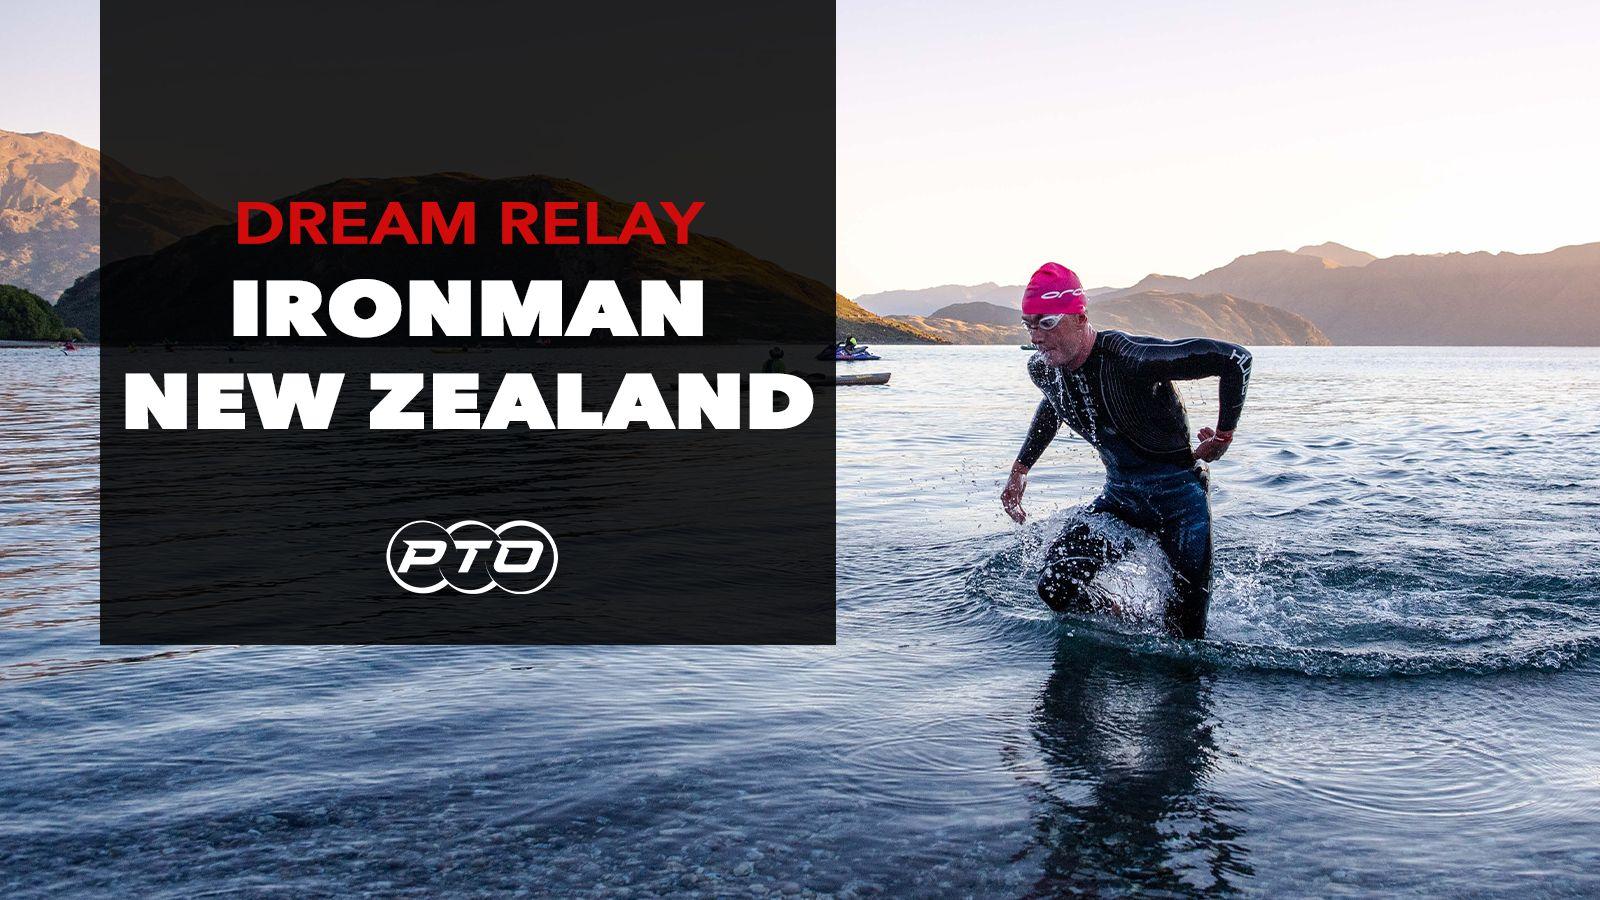 Dream Relay: Ironman New Zealand